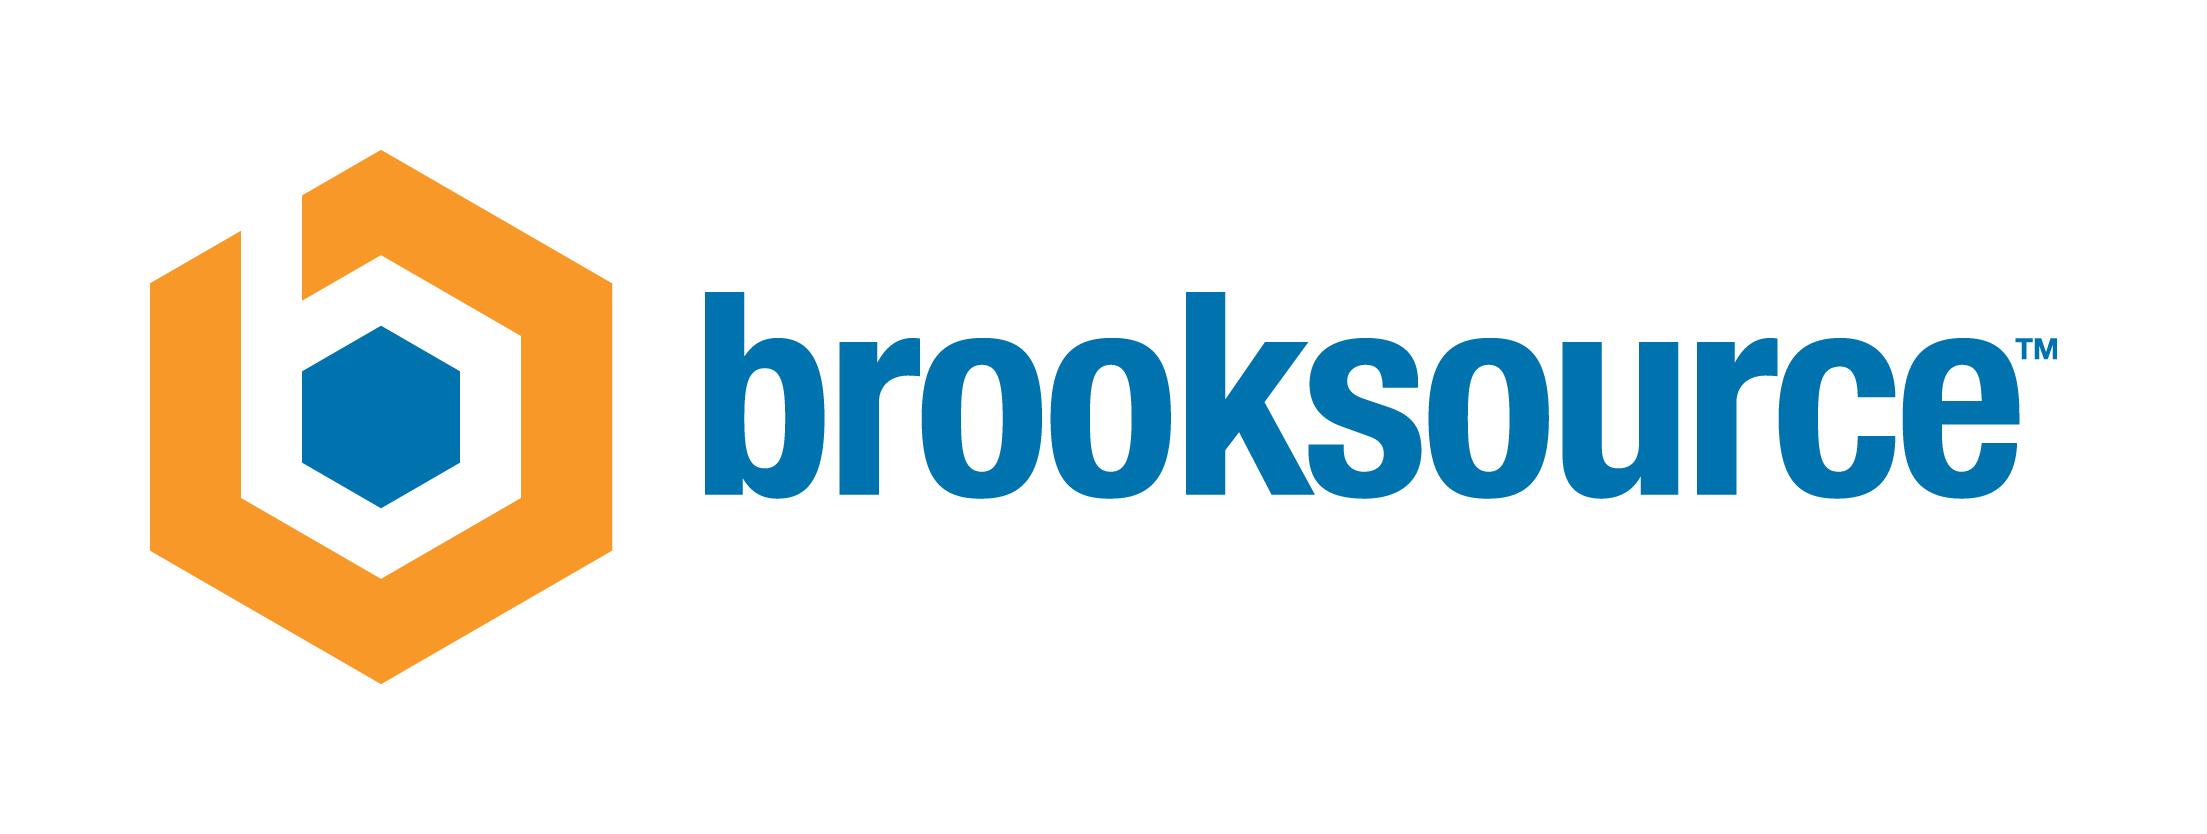 brooksource logo.jpg